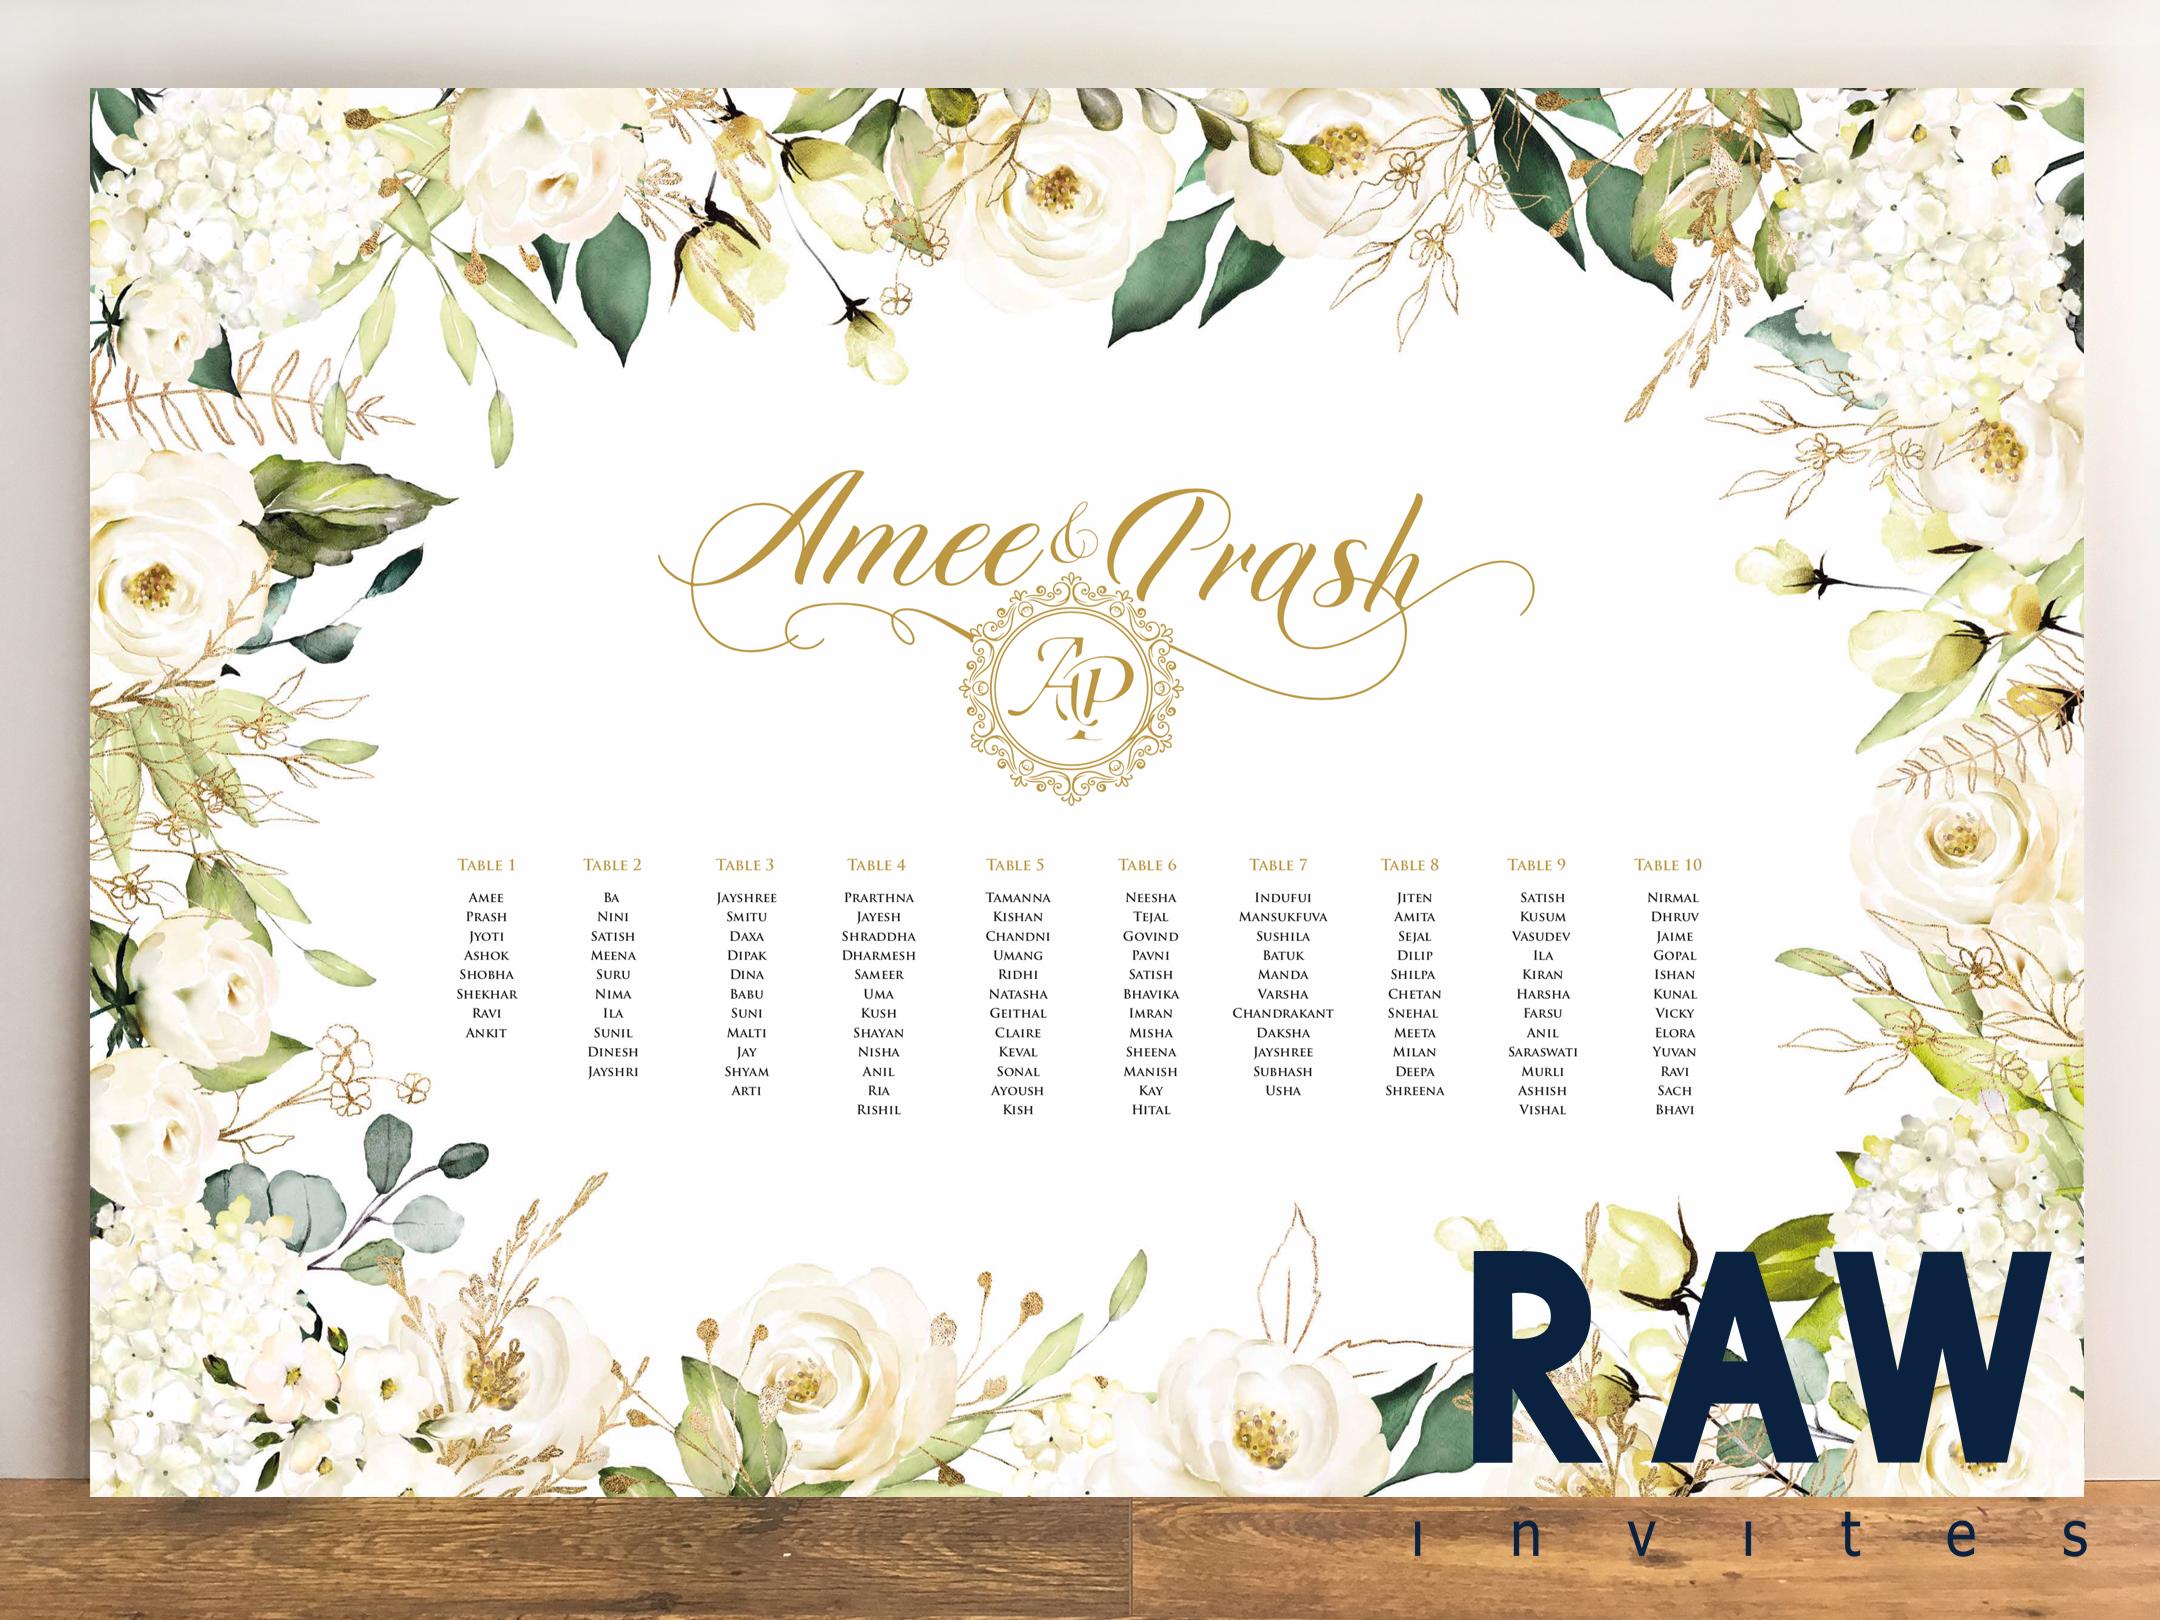 Amee & Prash (White Bliss)